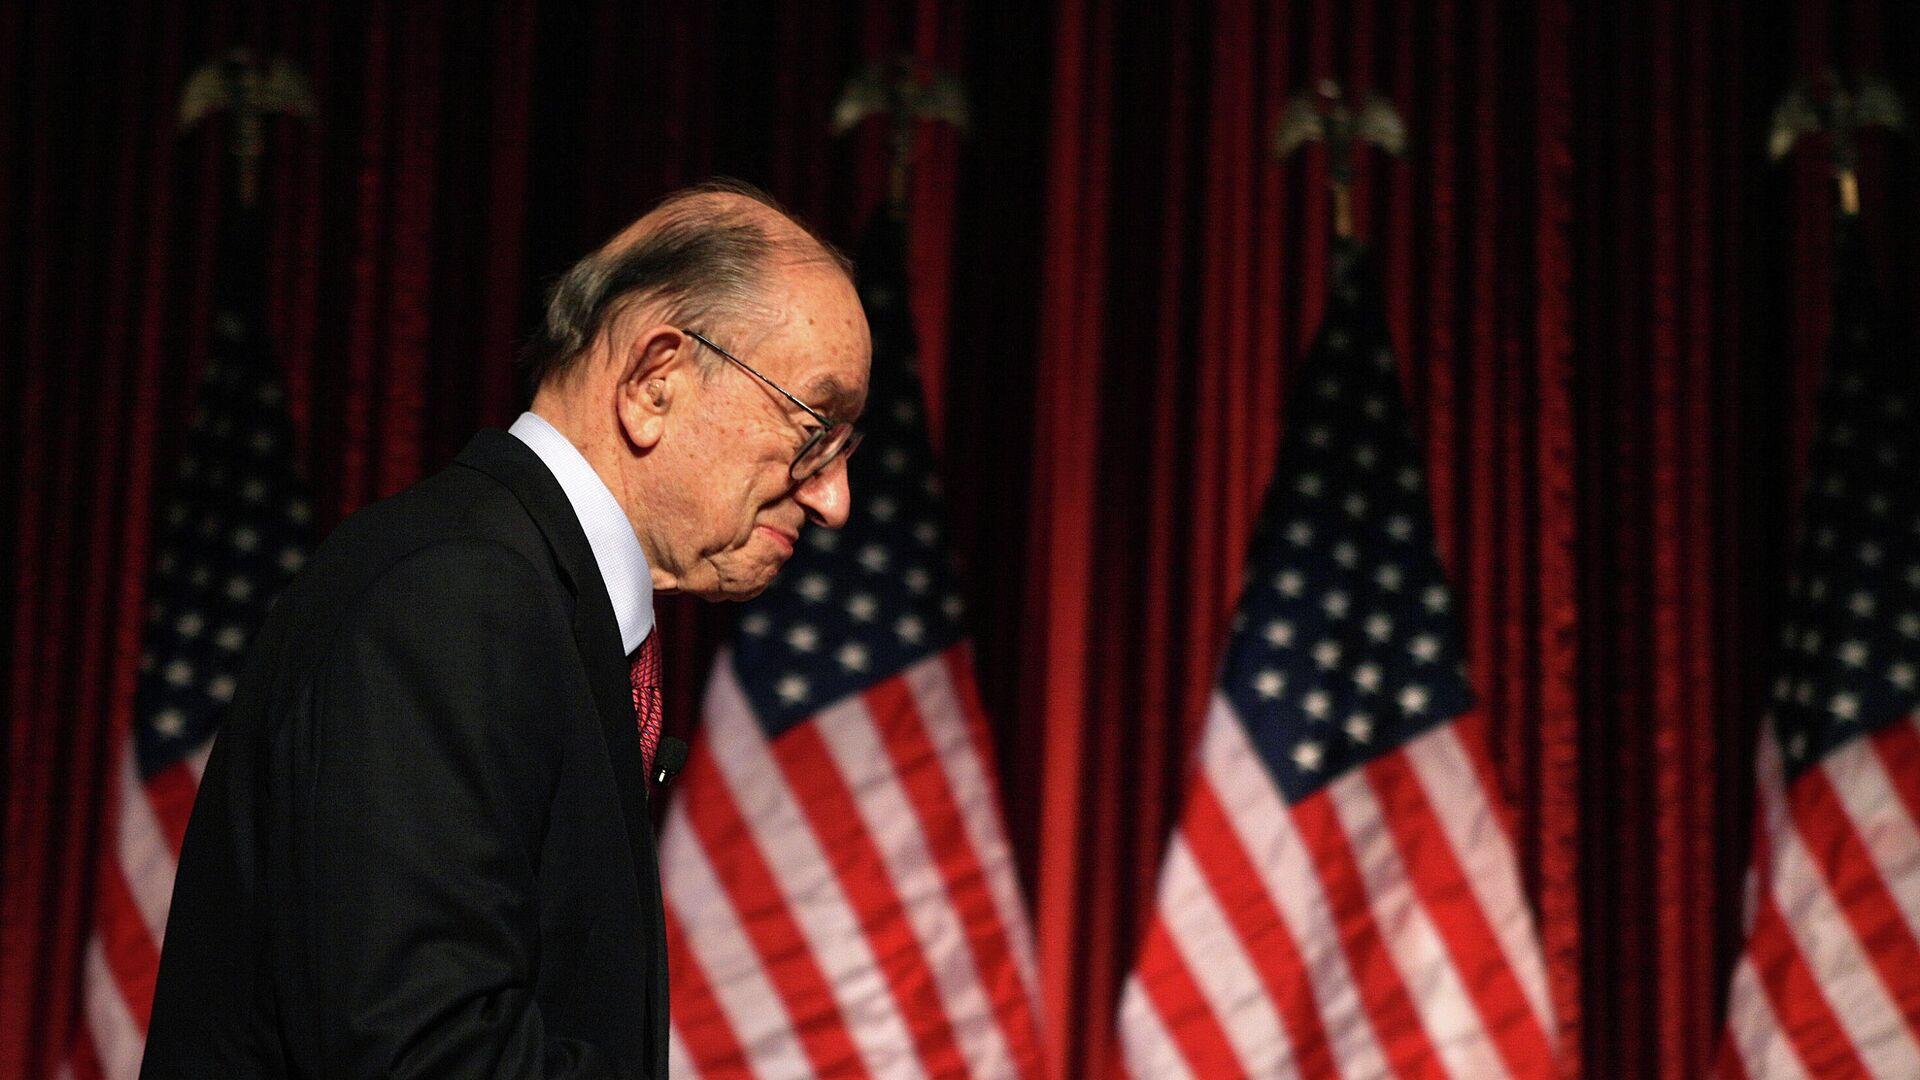 Экс-председатель ФРС США Алан Гринспен - РИА Новости, 1920, 16.09.2020